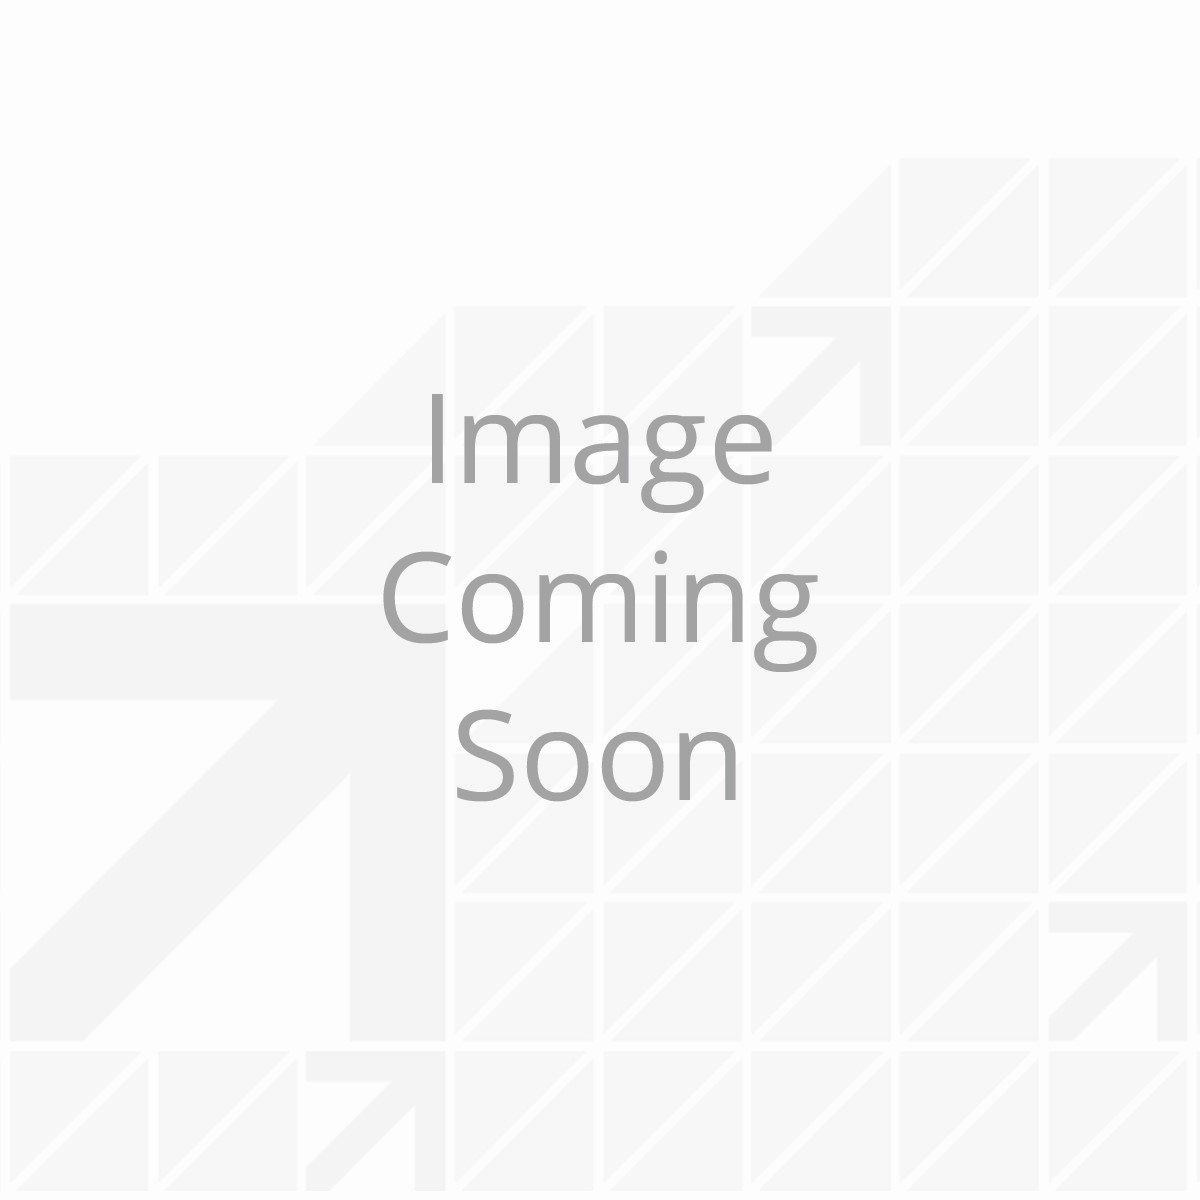 19' Power & Hybrid Awning Roller Assembly - Prepflex Green Fade